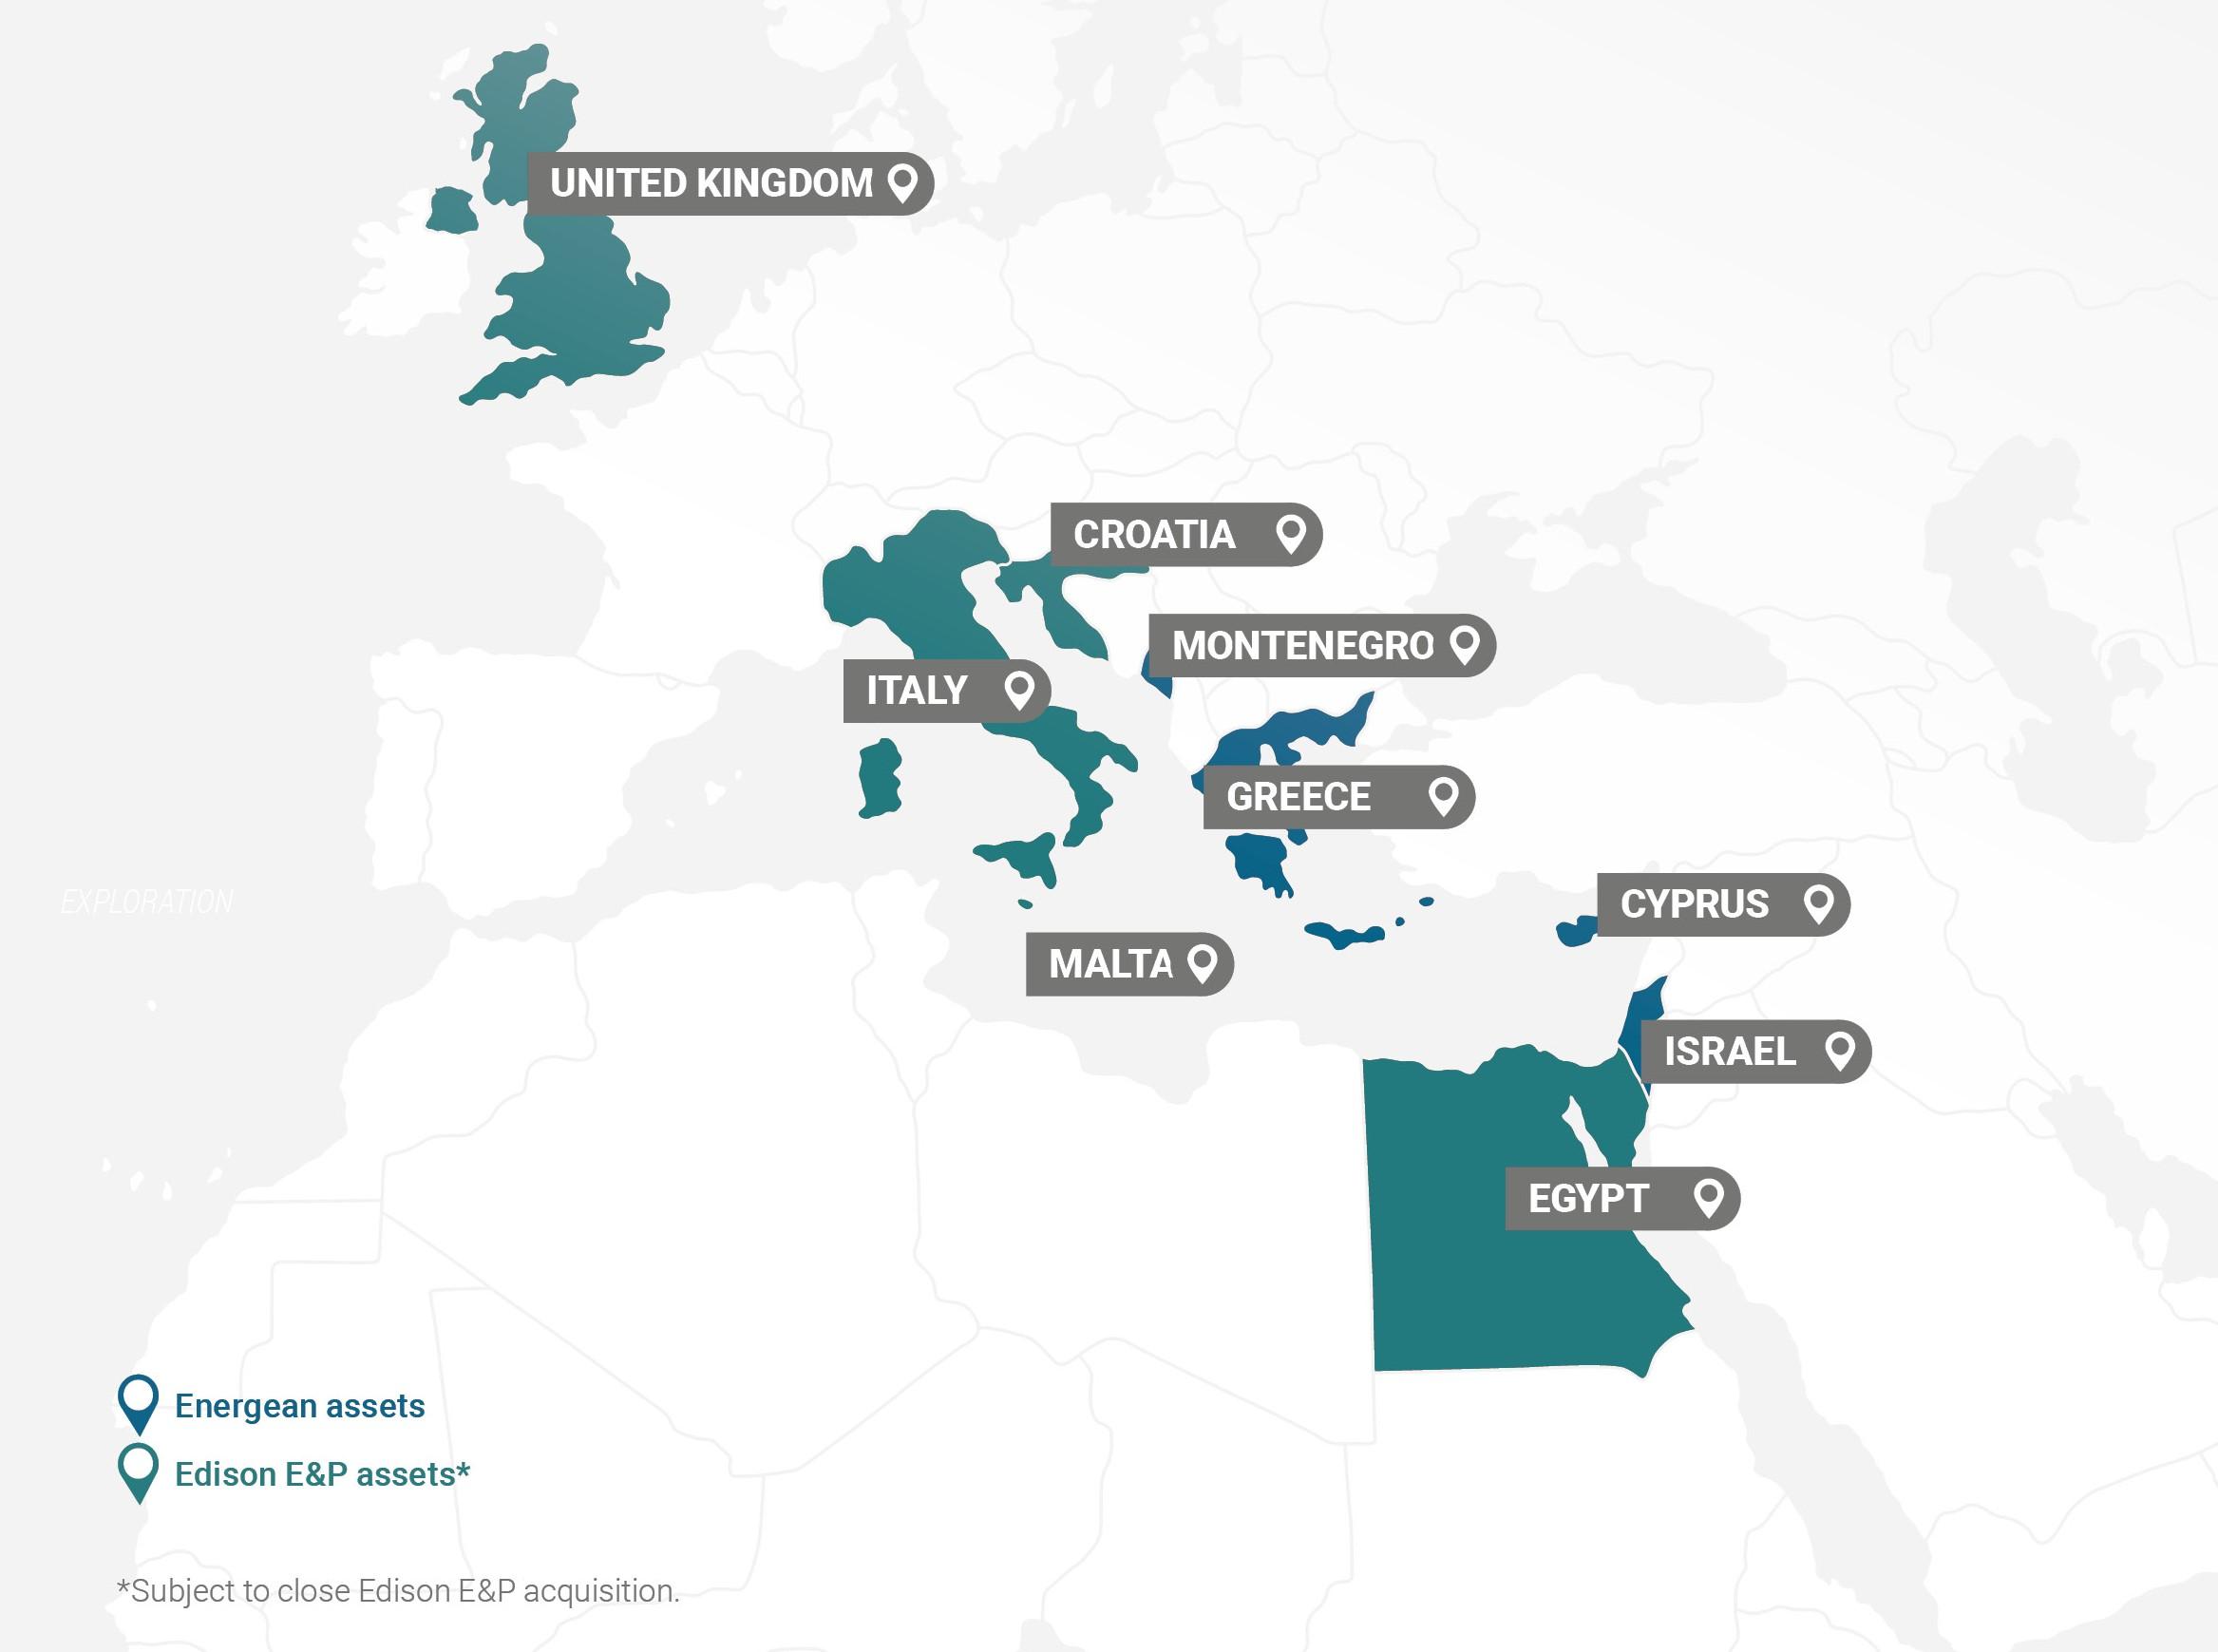 Energean: Αναδιάρθρωση εξαγοράς της Edison E&P και επέκταση στη Βόρεια Θάλασσα